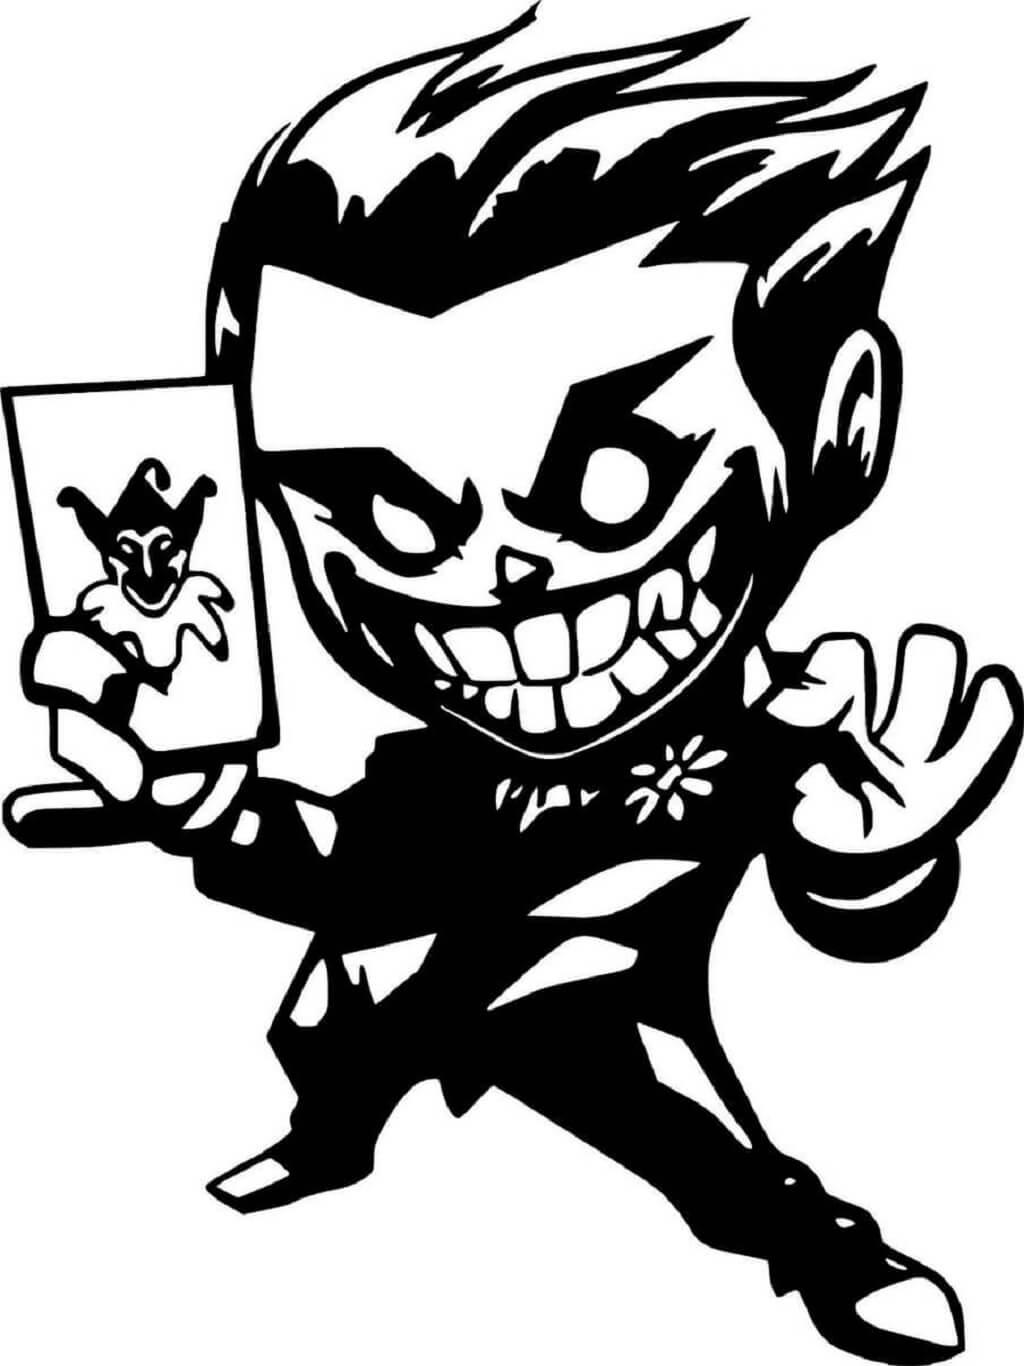 Cute Chibi Joker white black android wallpaper